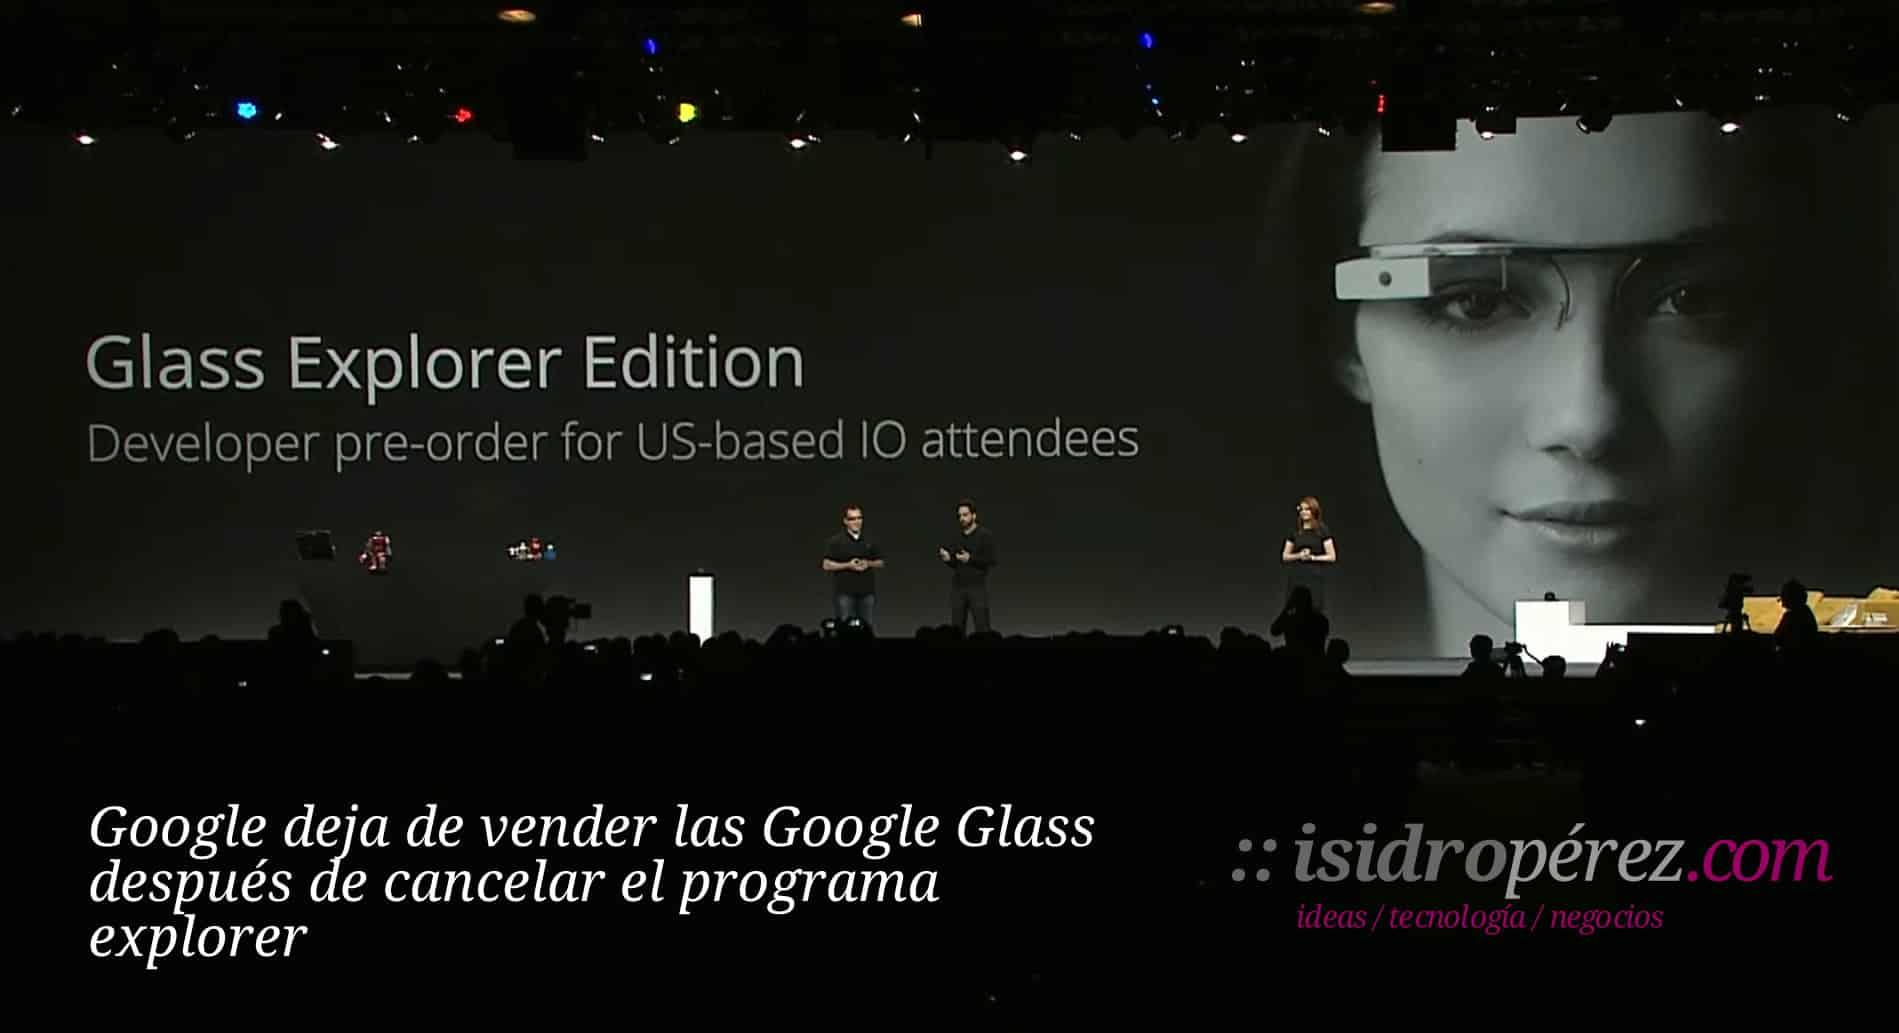 Google deja de vender las Google Glass